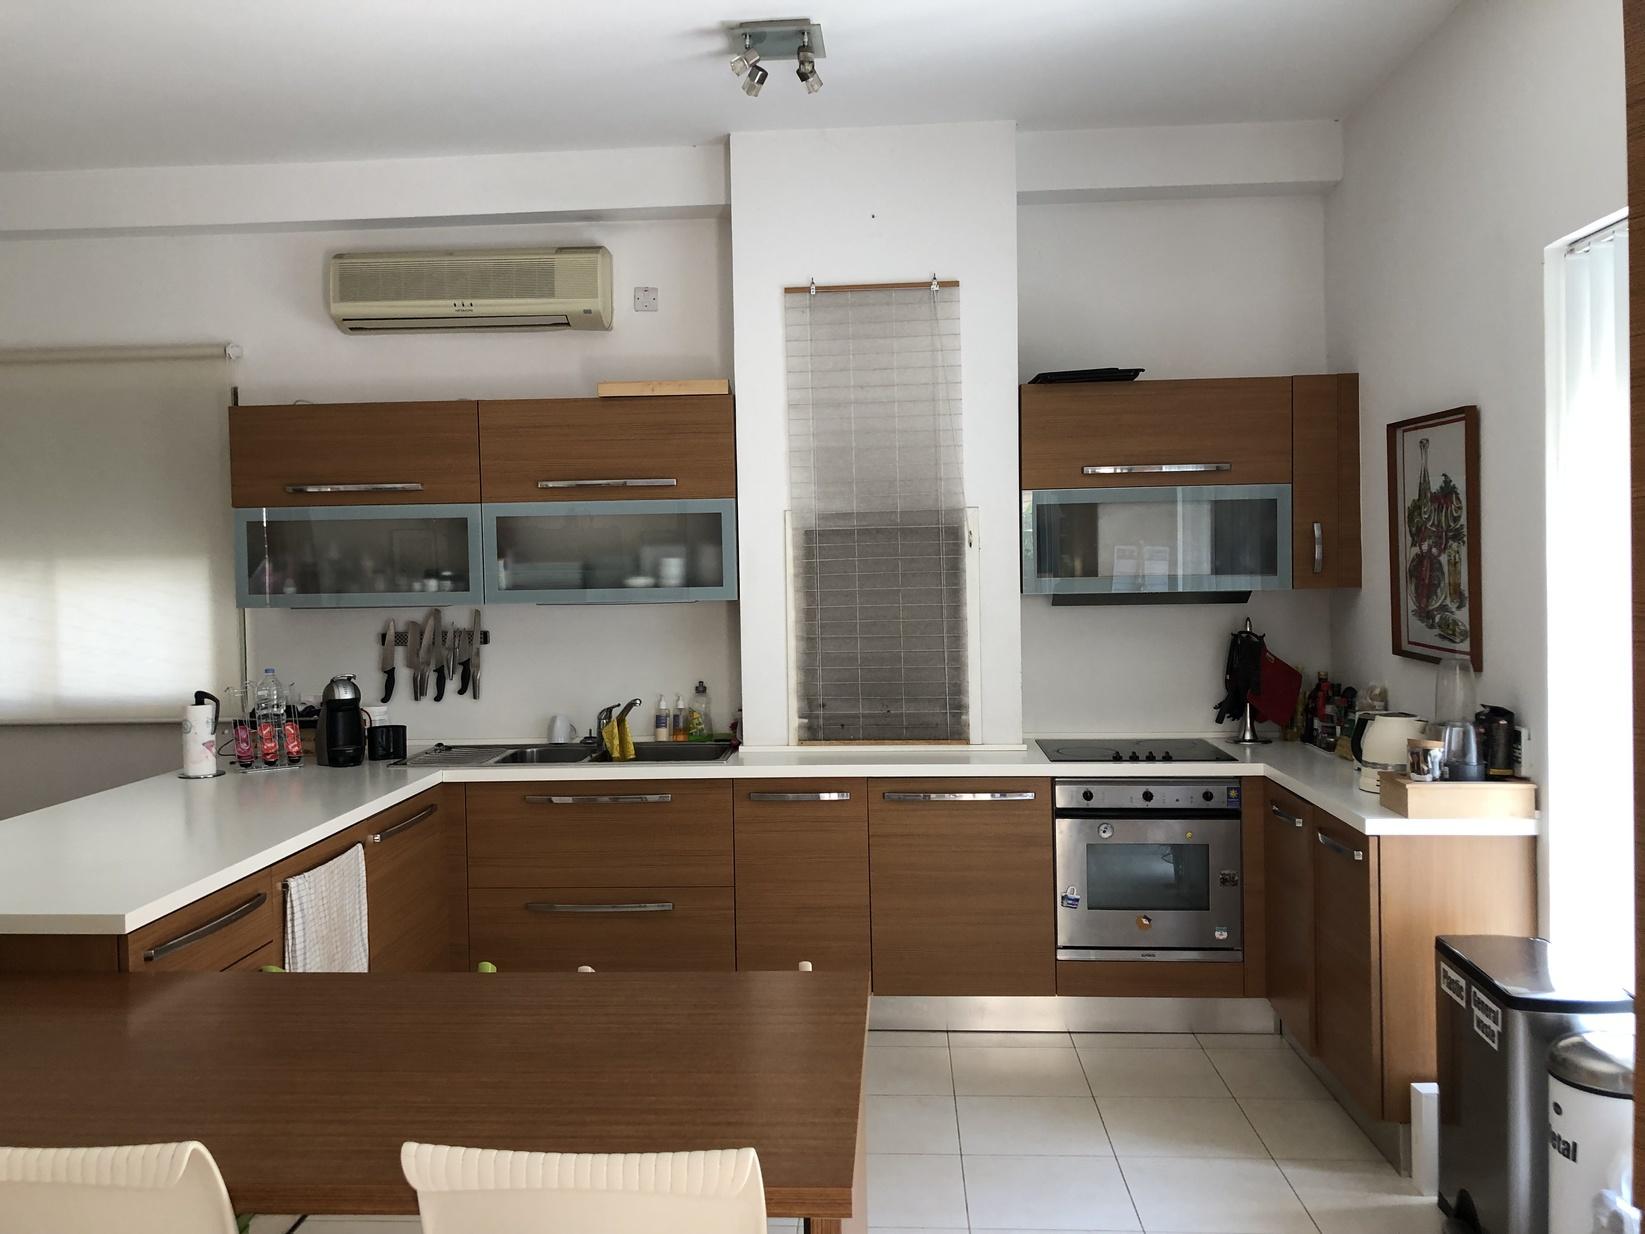 3 bed Apartment For Rent in Sliema, Sliema - thumb 26